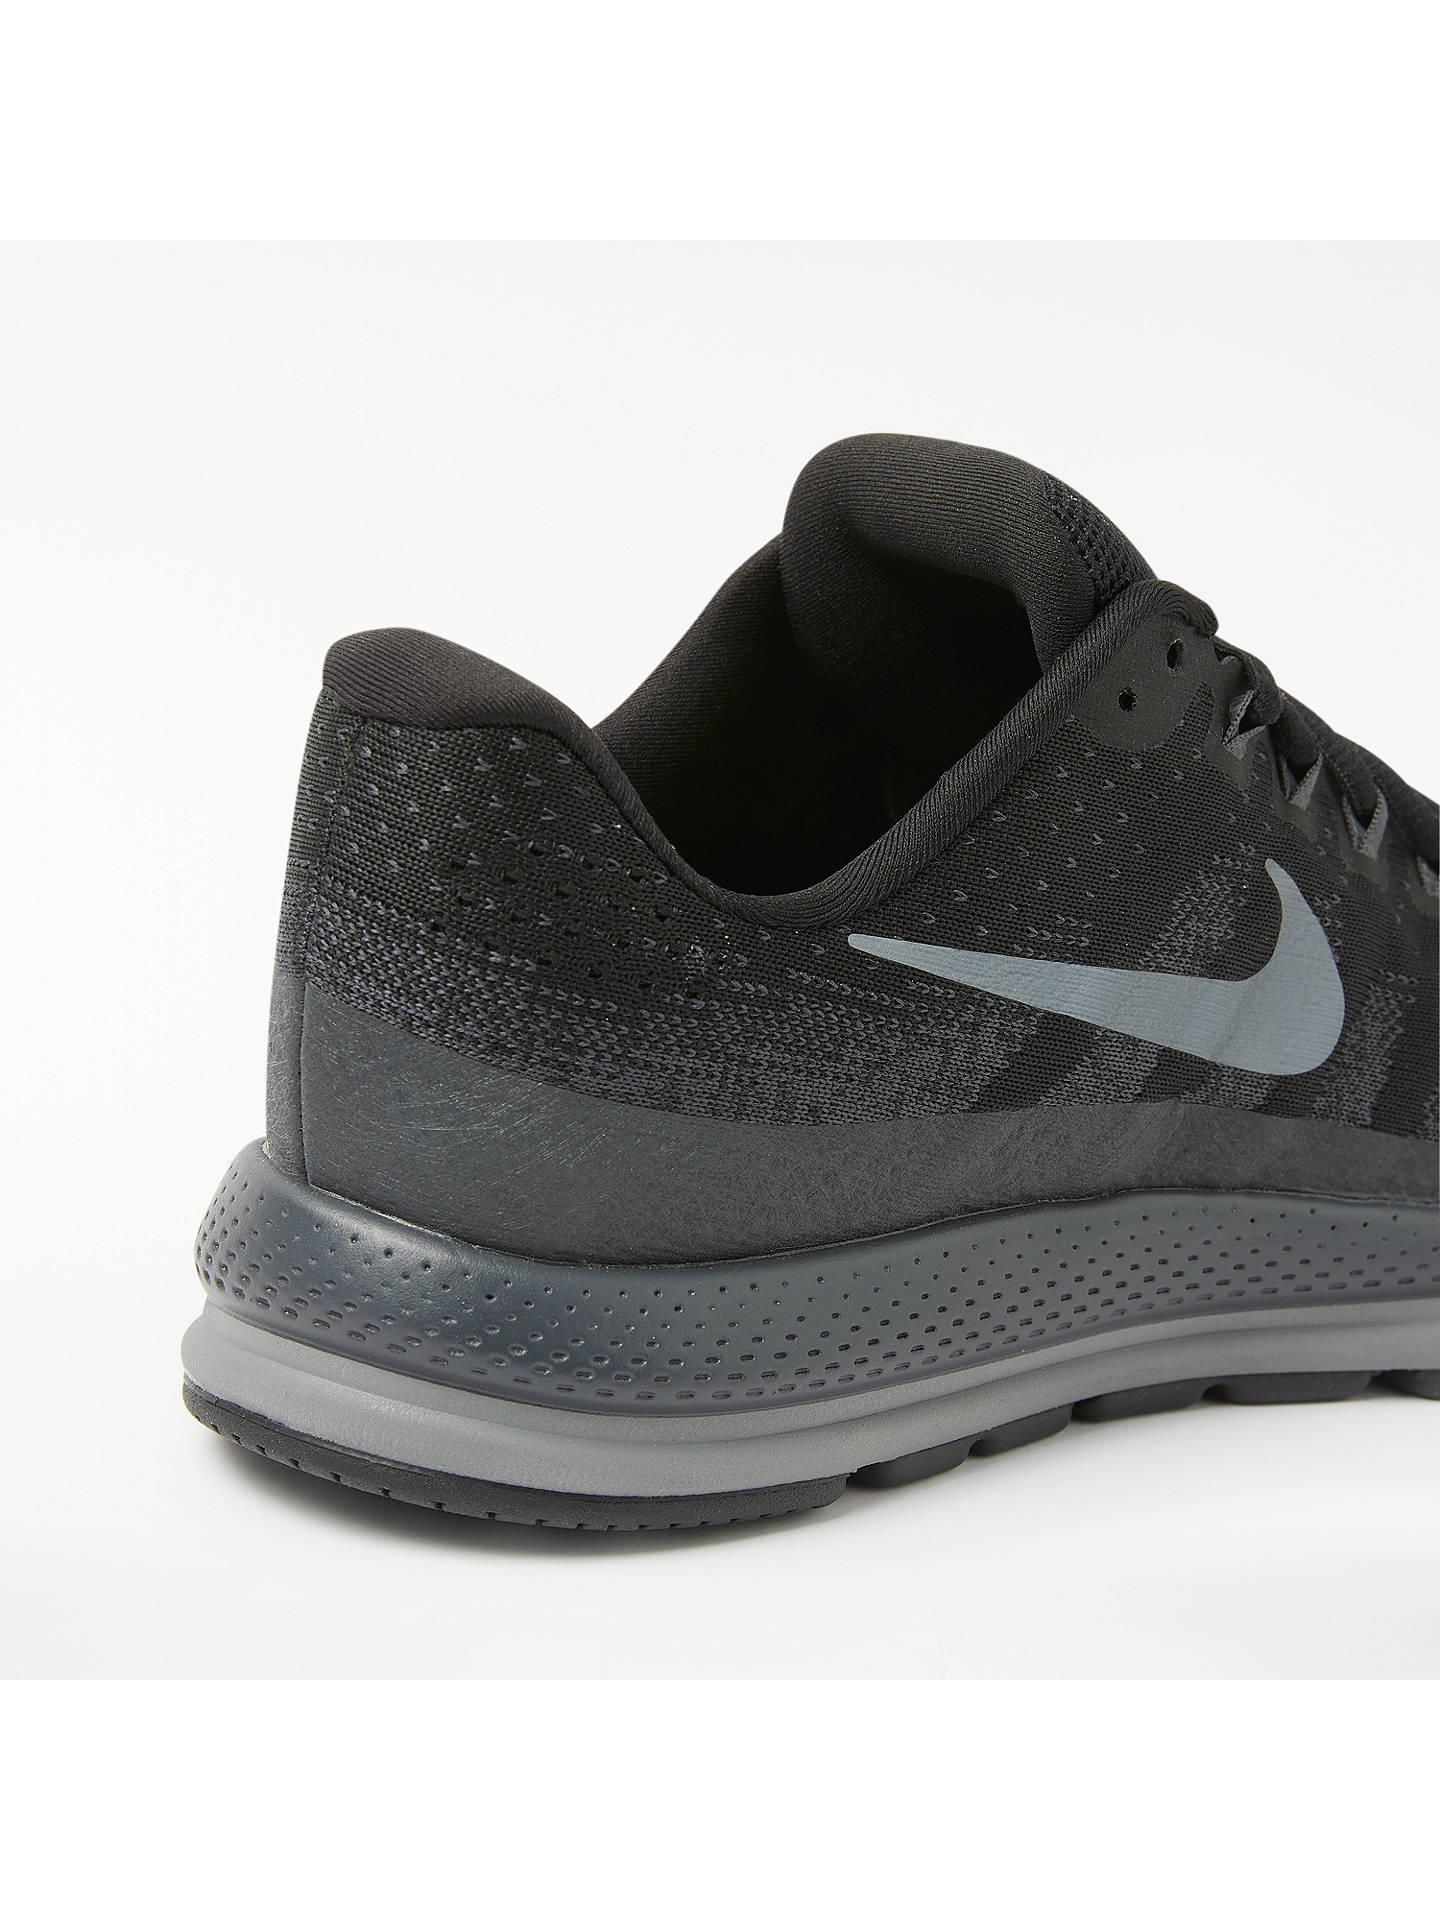 626ea60090b ... Buy Nike Air Zoom Vomero 13 Men s Running Shoes